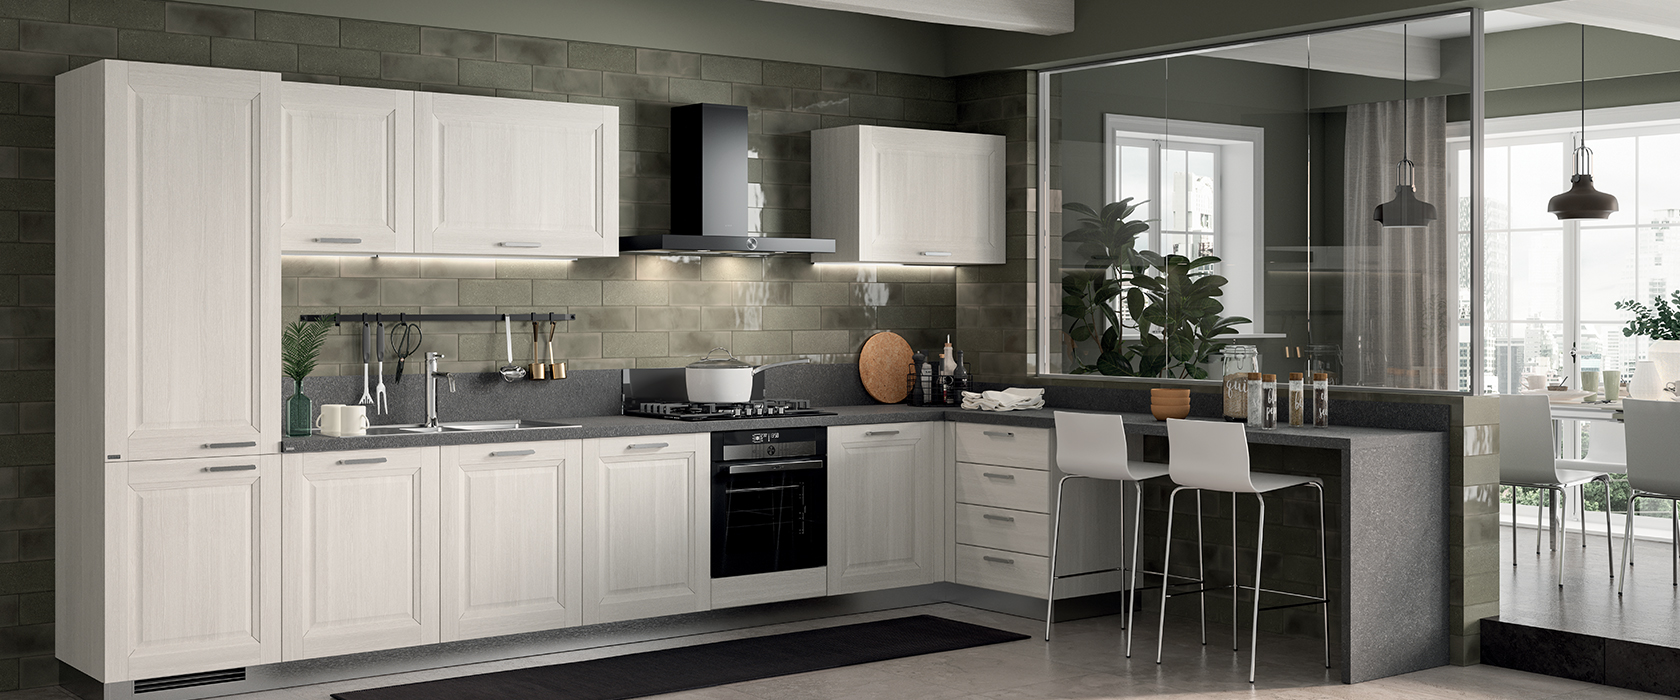 12665_cucina-family-scavolini-easy-01